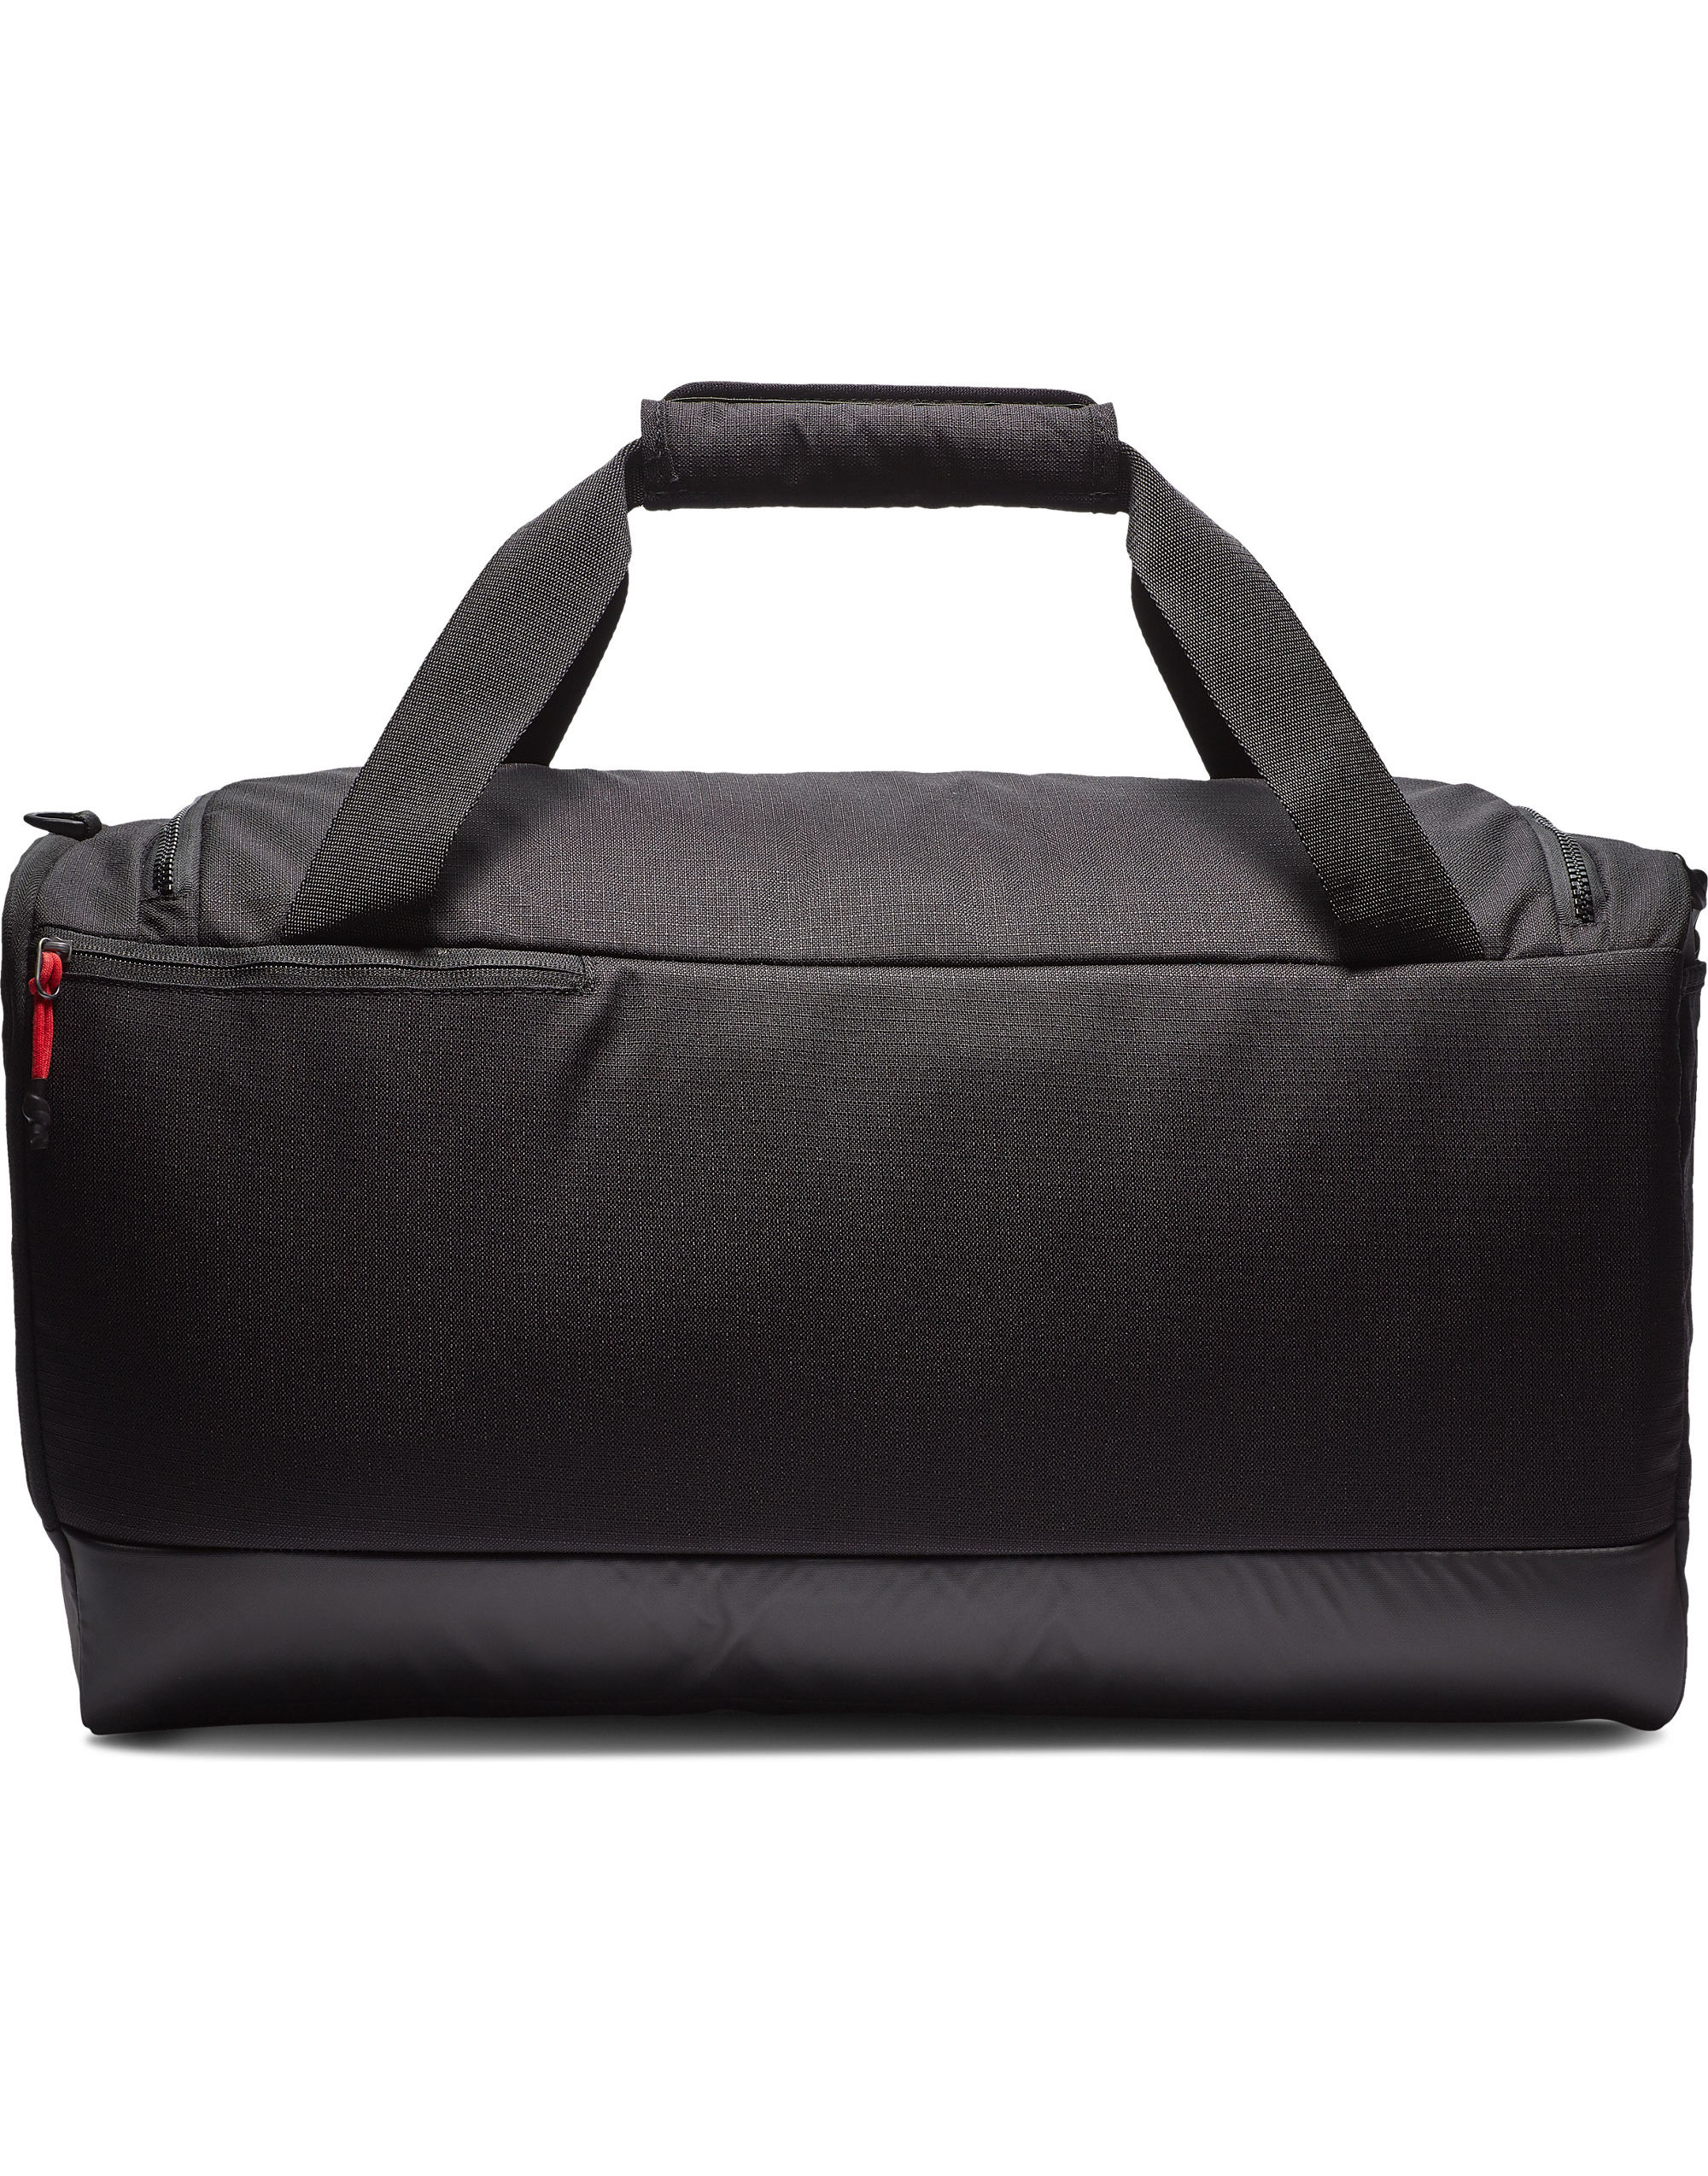 Nike Golf Sports Duffel Bag